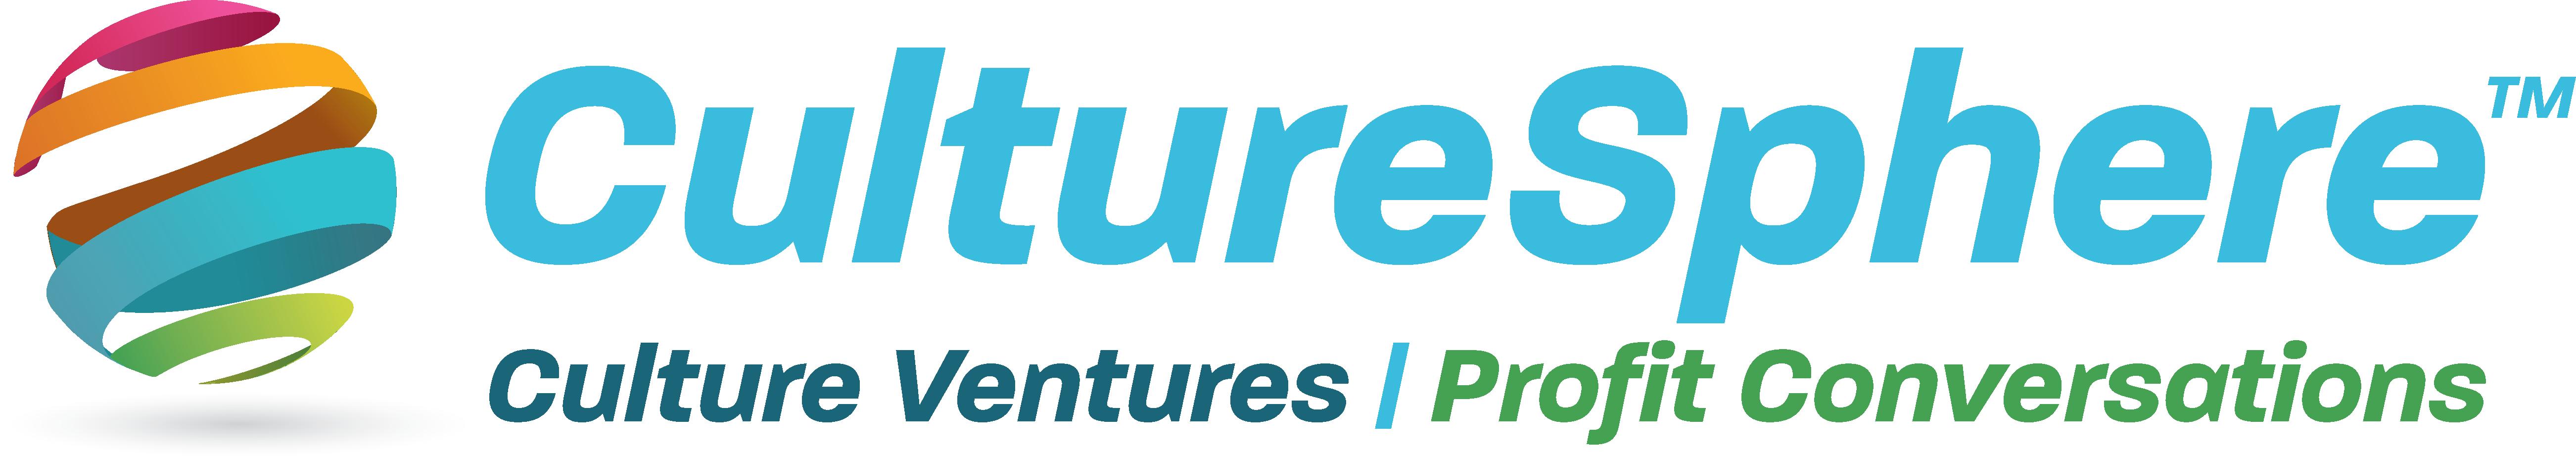 CultureSphere-cultureVentures-ProfitConversations-horizontal-2021